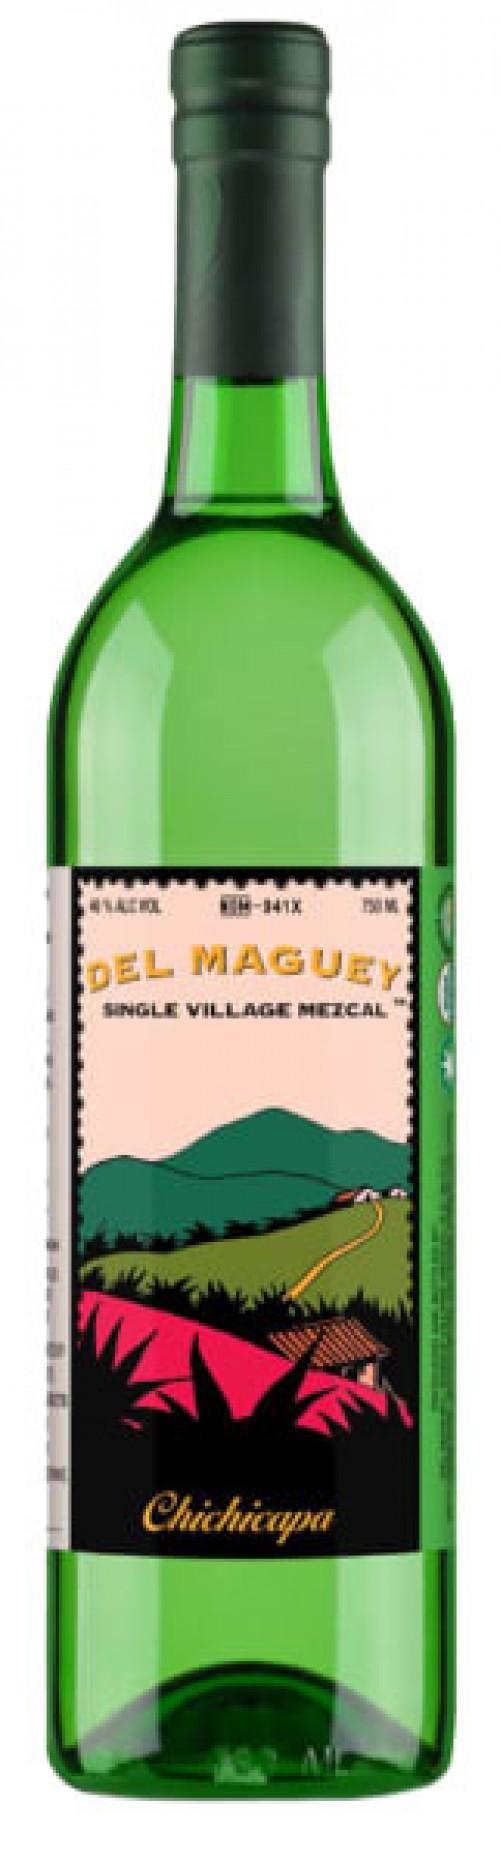 Del Maguey Chichicapa Mezcal 750ml